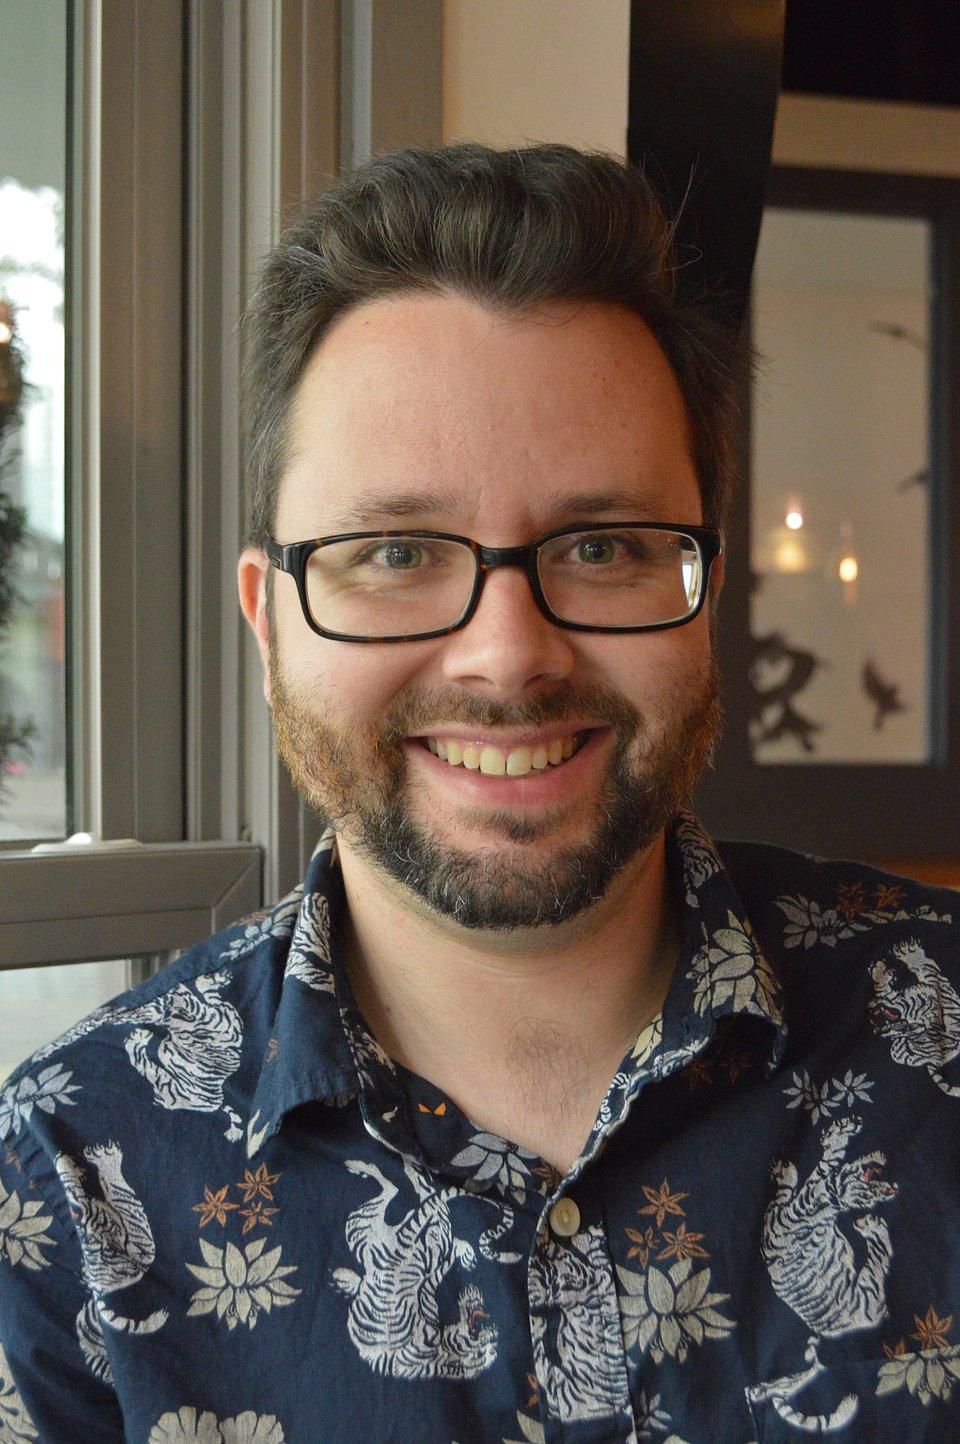 Daniel Herriges, Senior Editor at Strong Towns